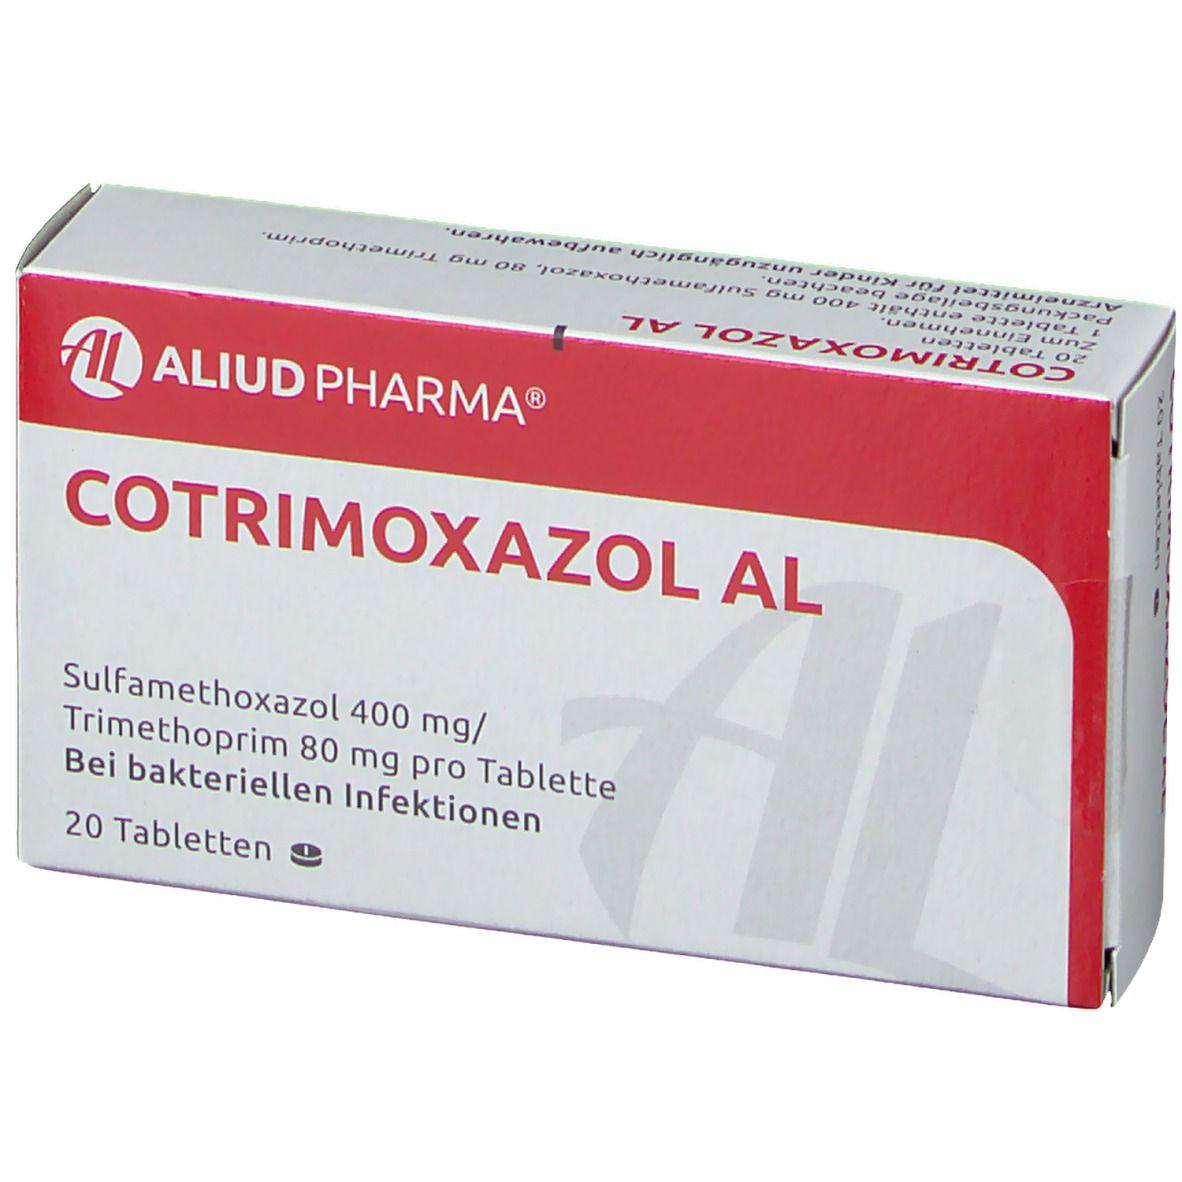 Nebenwirkungen cotrimoxazol al forte COTRIMOXAZOL AL